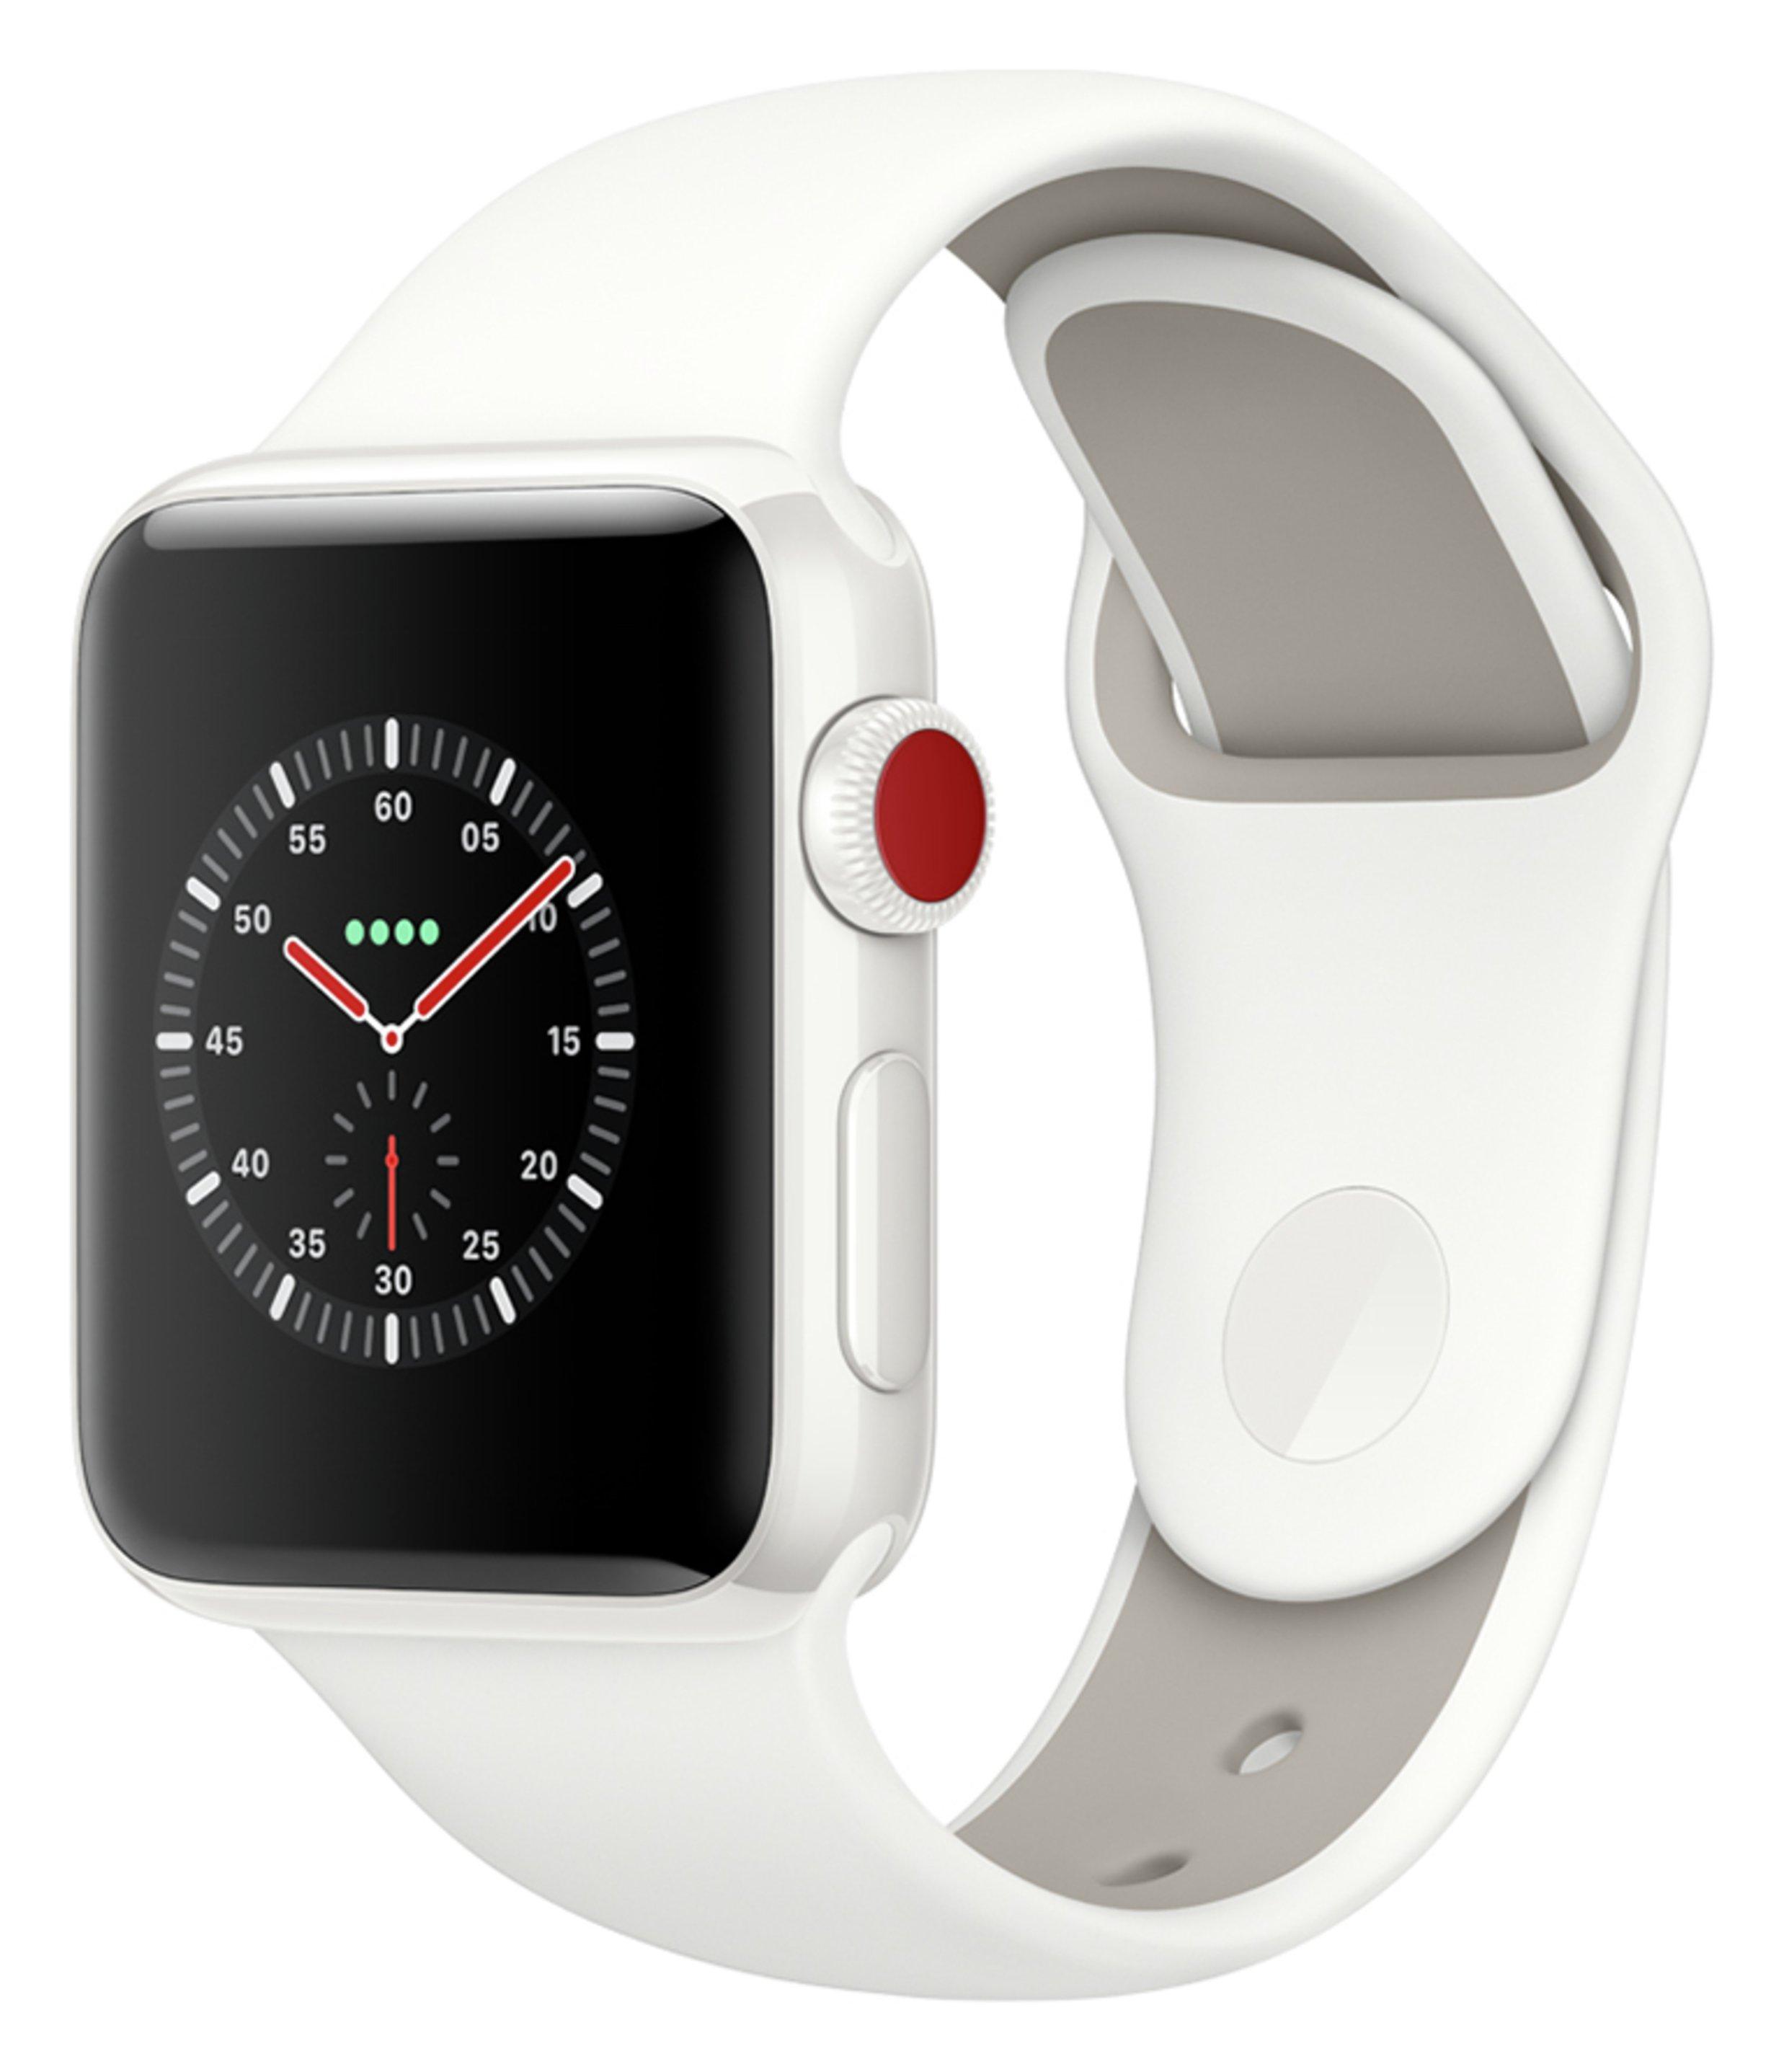 Apple Apple Watch S3 Edition Cellular 38mm - White Ceramic